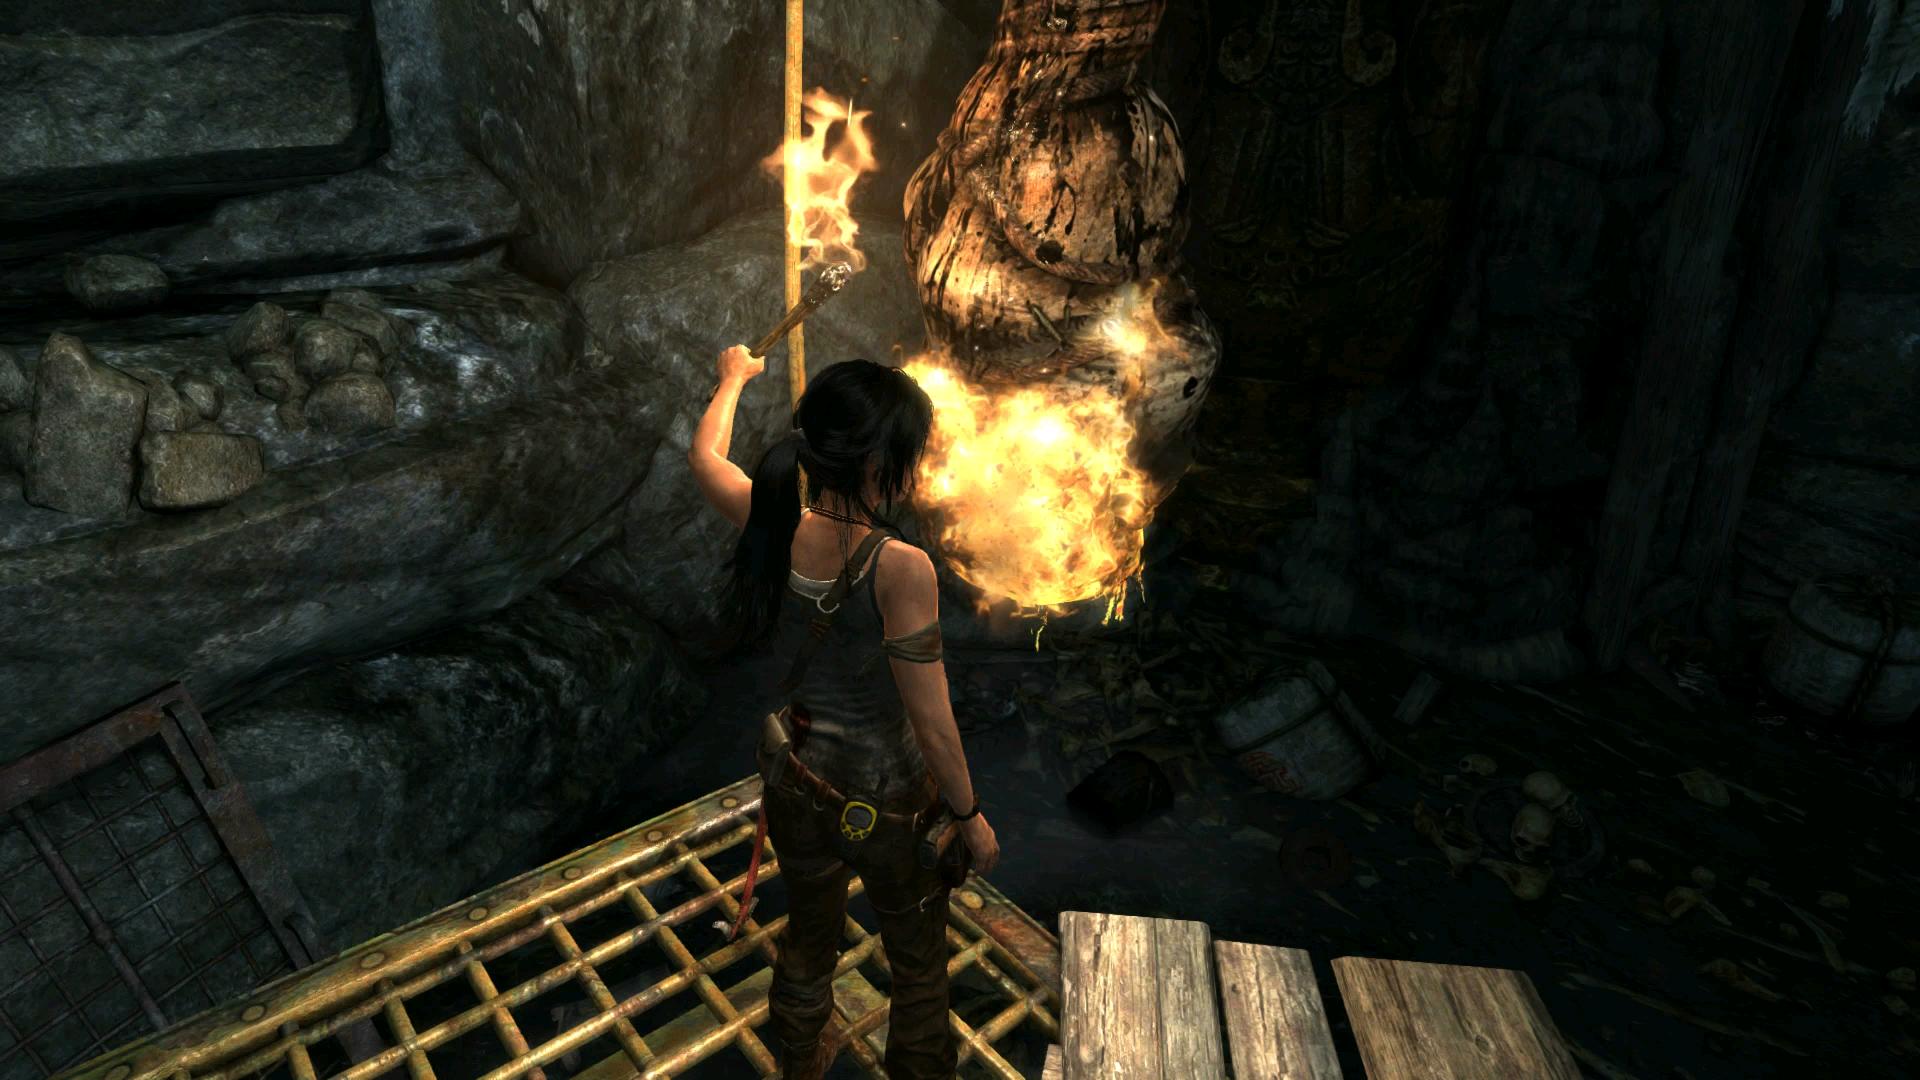 Lightin' up some dangling corpses, no big